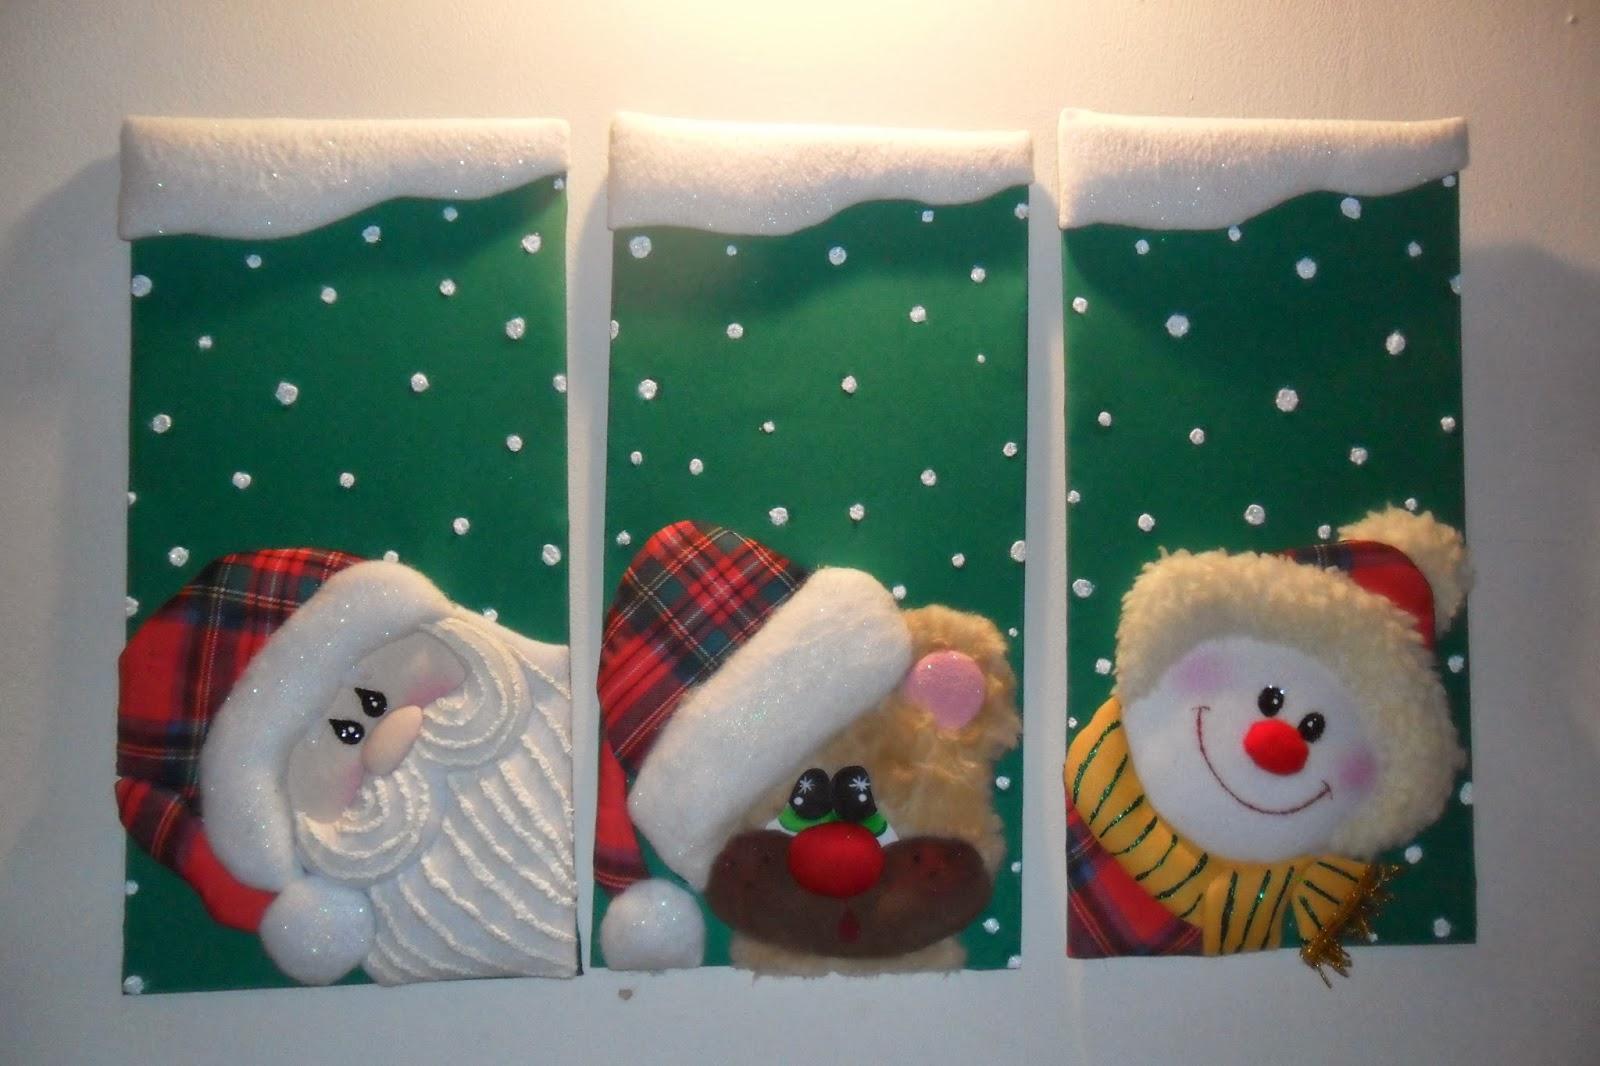 Mardedi cuadros para decorar tu navidad - Fotografias para decorar ...